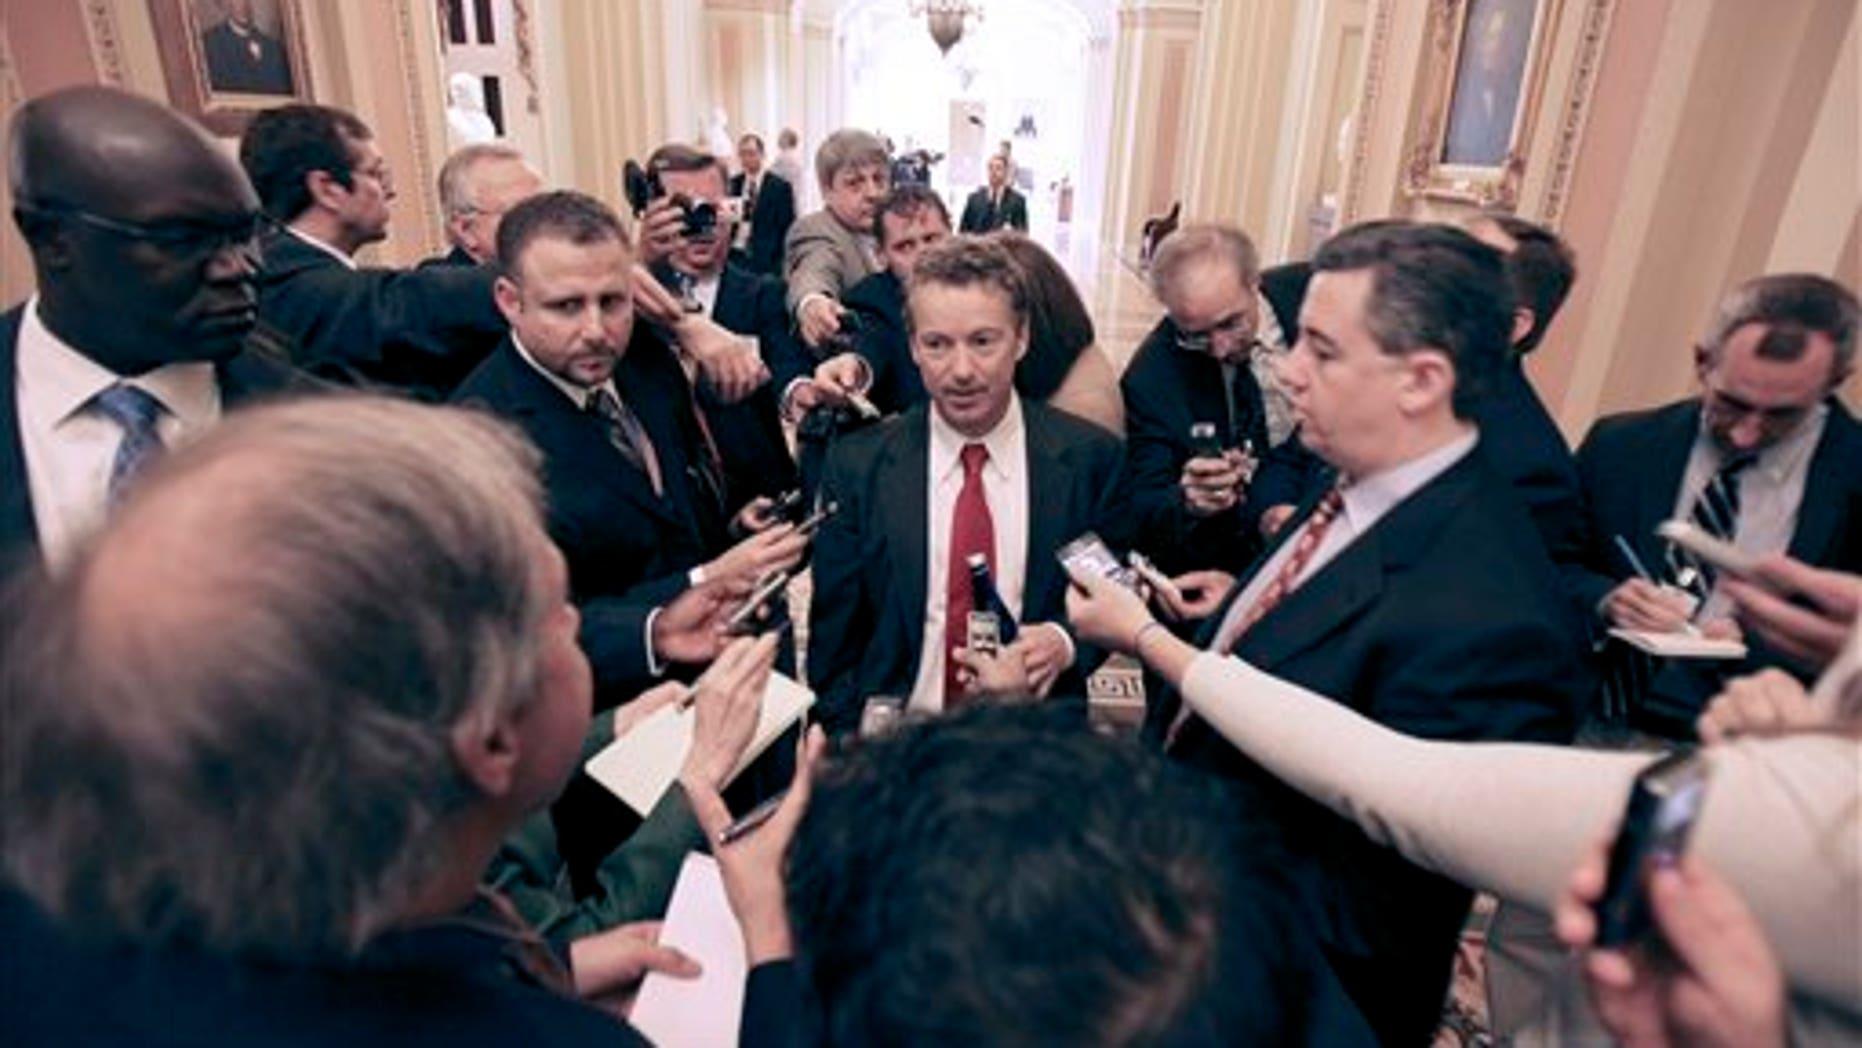 Rand Paul at the U.S. Capitol on November 15